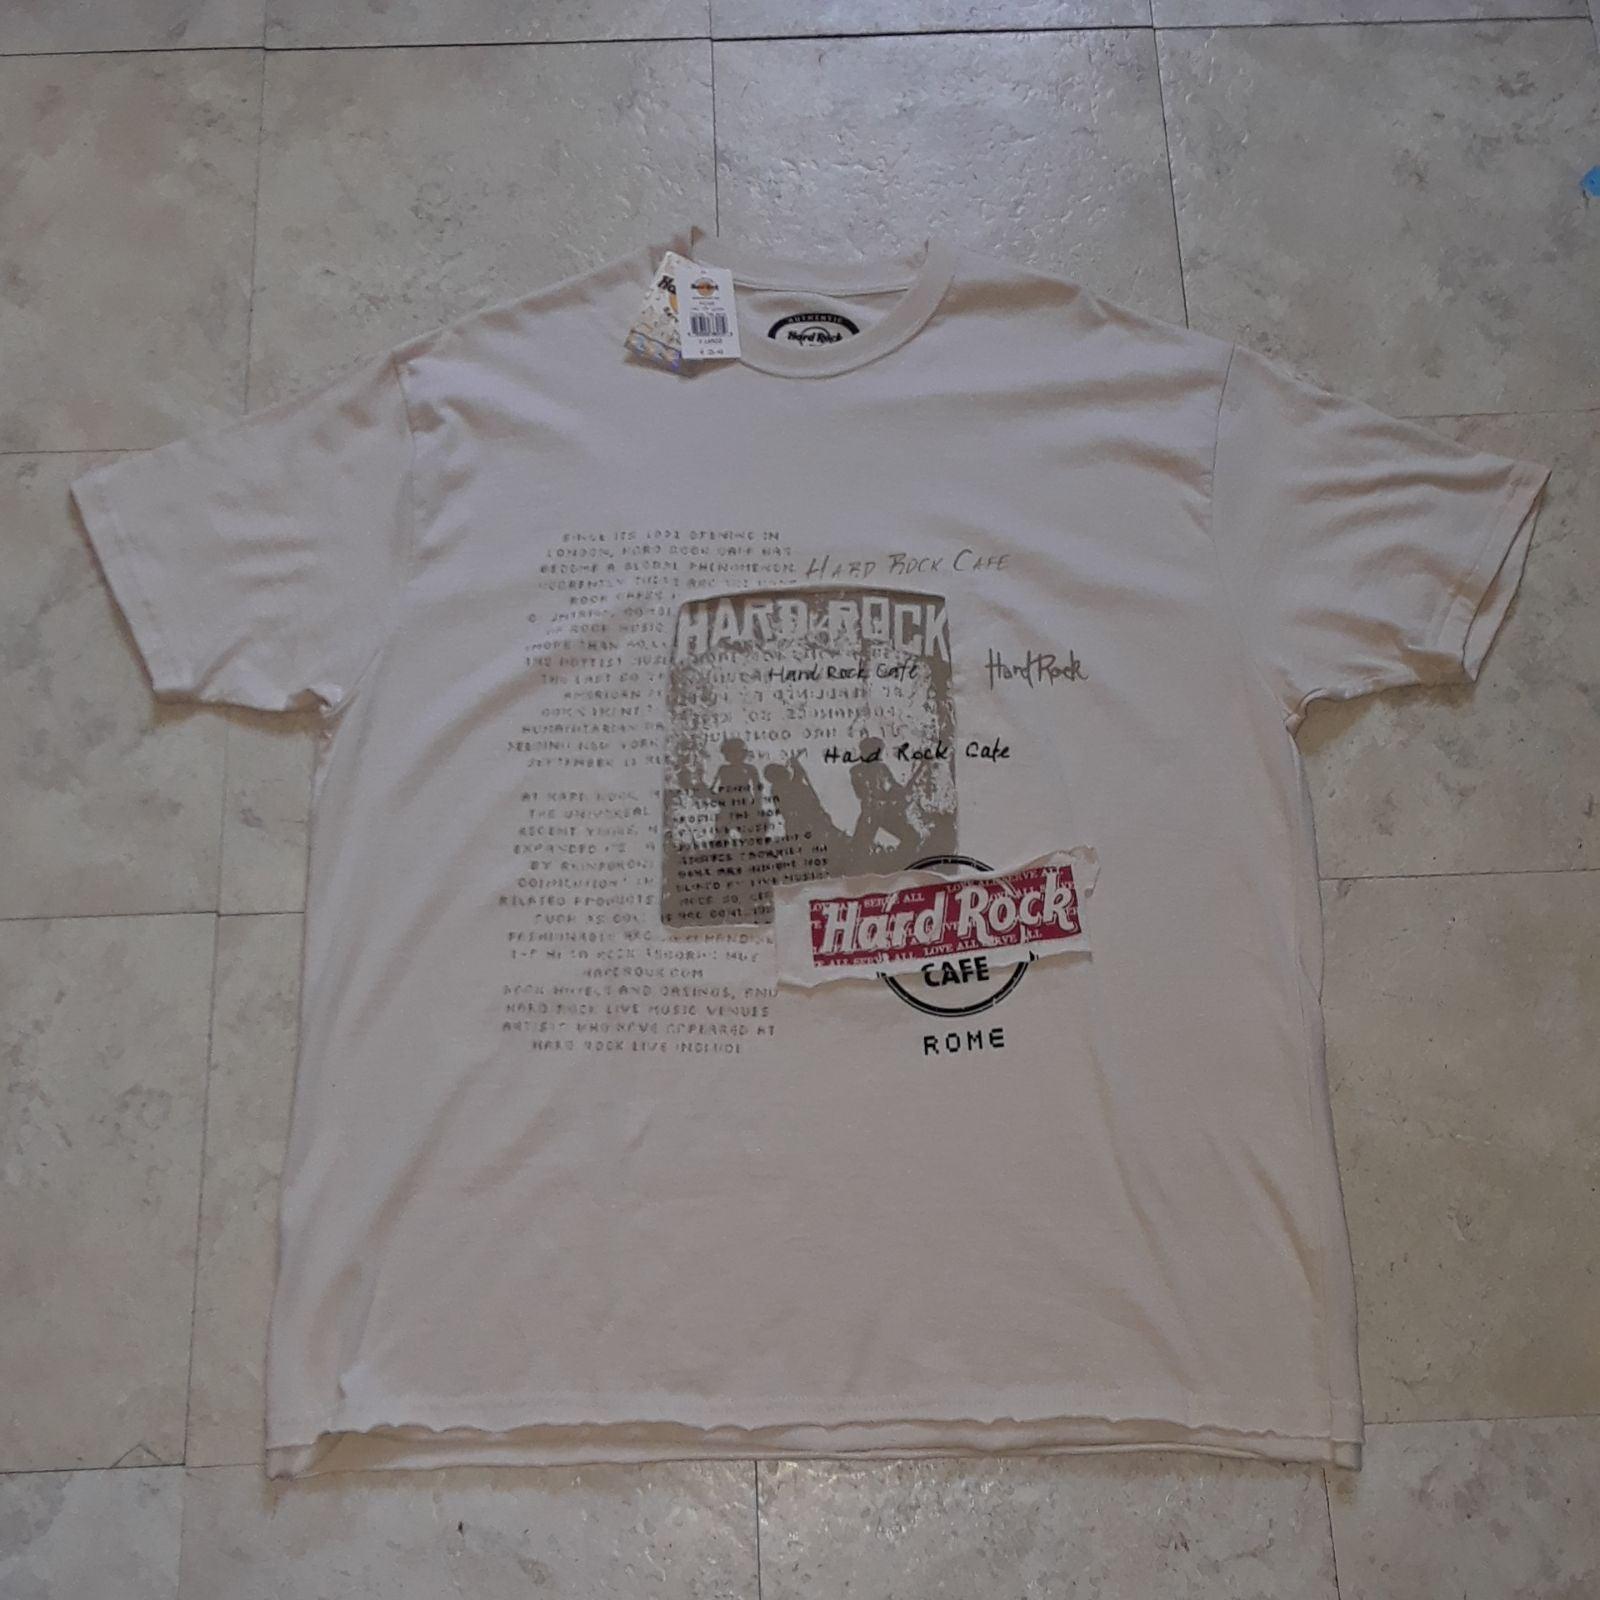 Hard Rock Cafe shirt